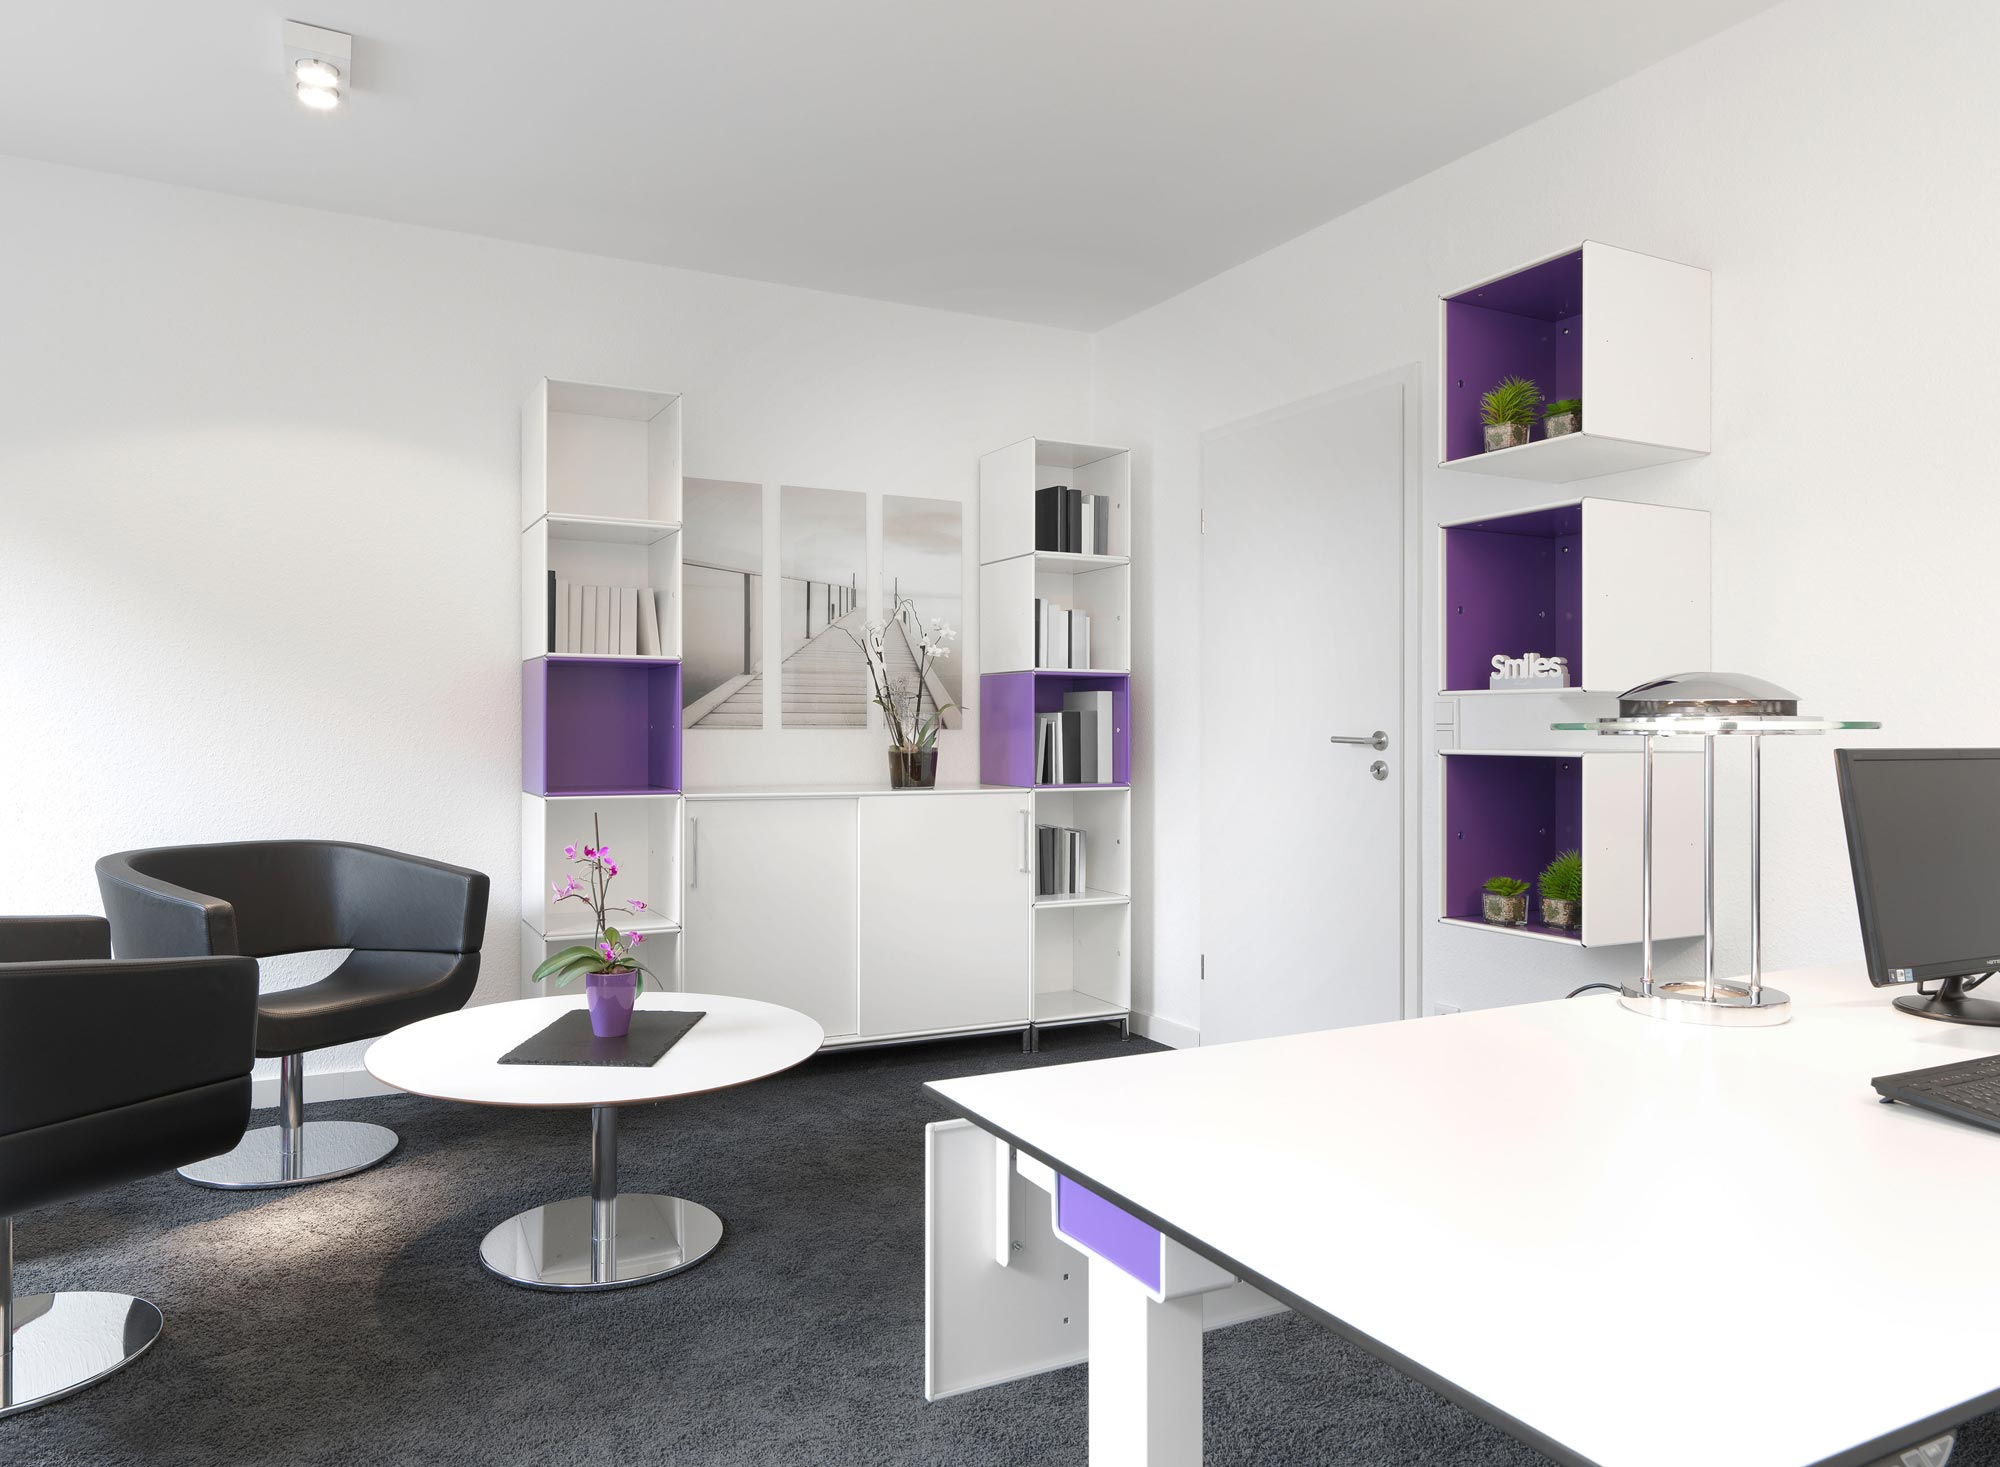 Home - Büro & objekt by ORDNUNG e.K